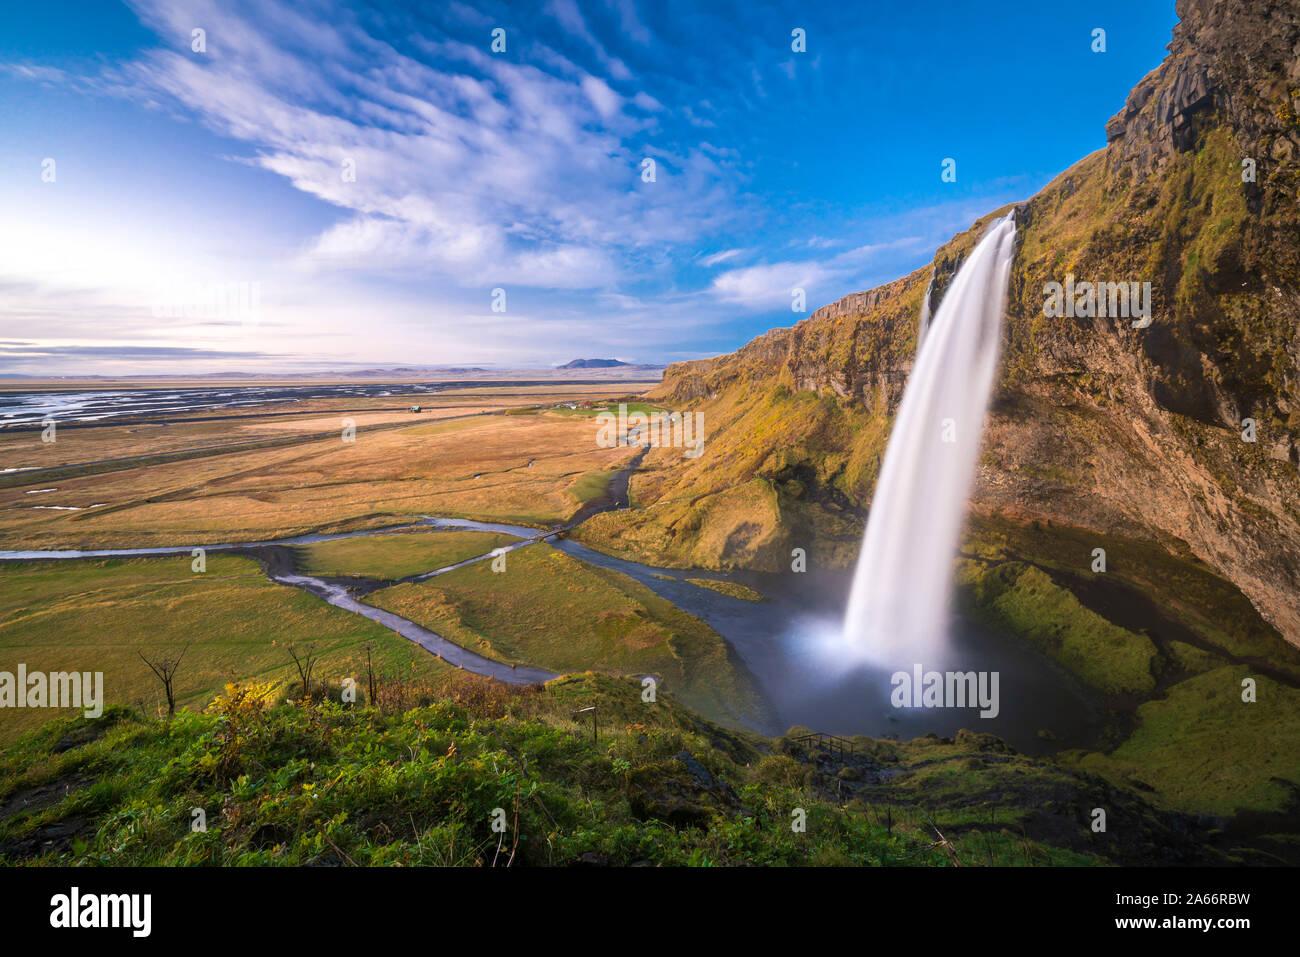 Vista panorámica de la cascada Seljalandsfoss de Hill, en el sur de Islandia, Islandia Foto de stock